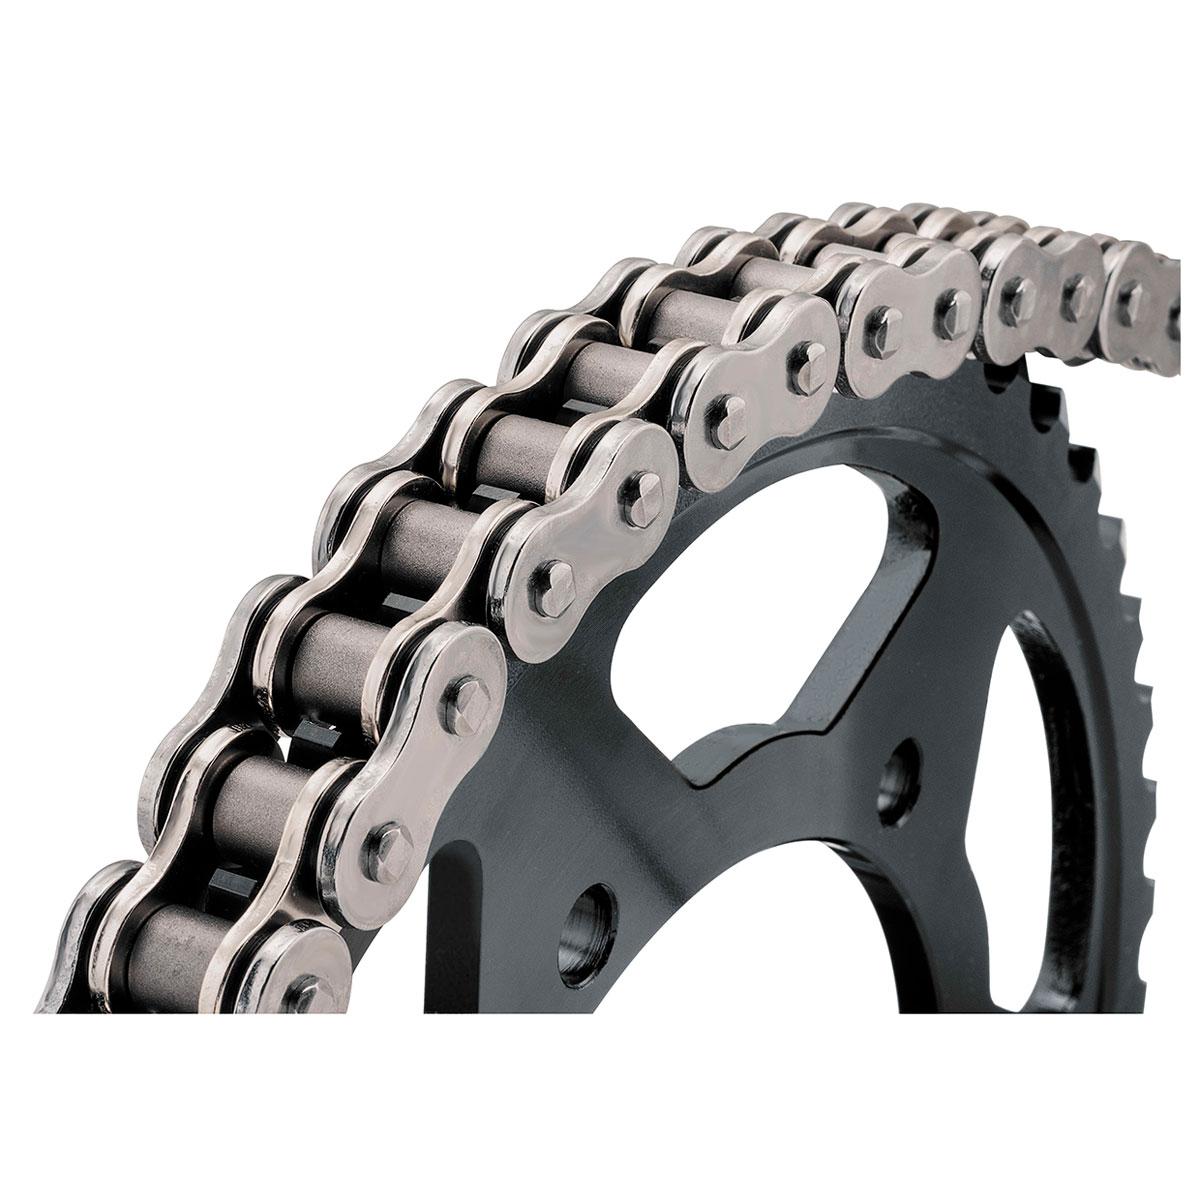 BikeMaster 530 BMXR X-Ring Chain Natural